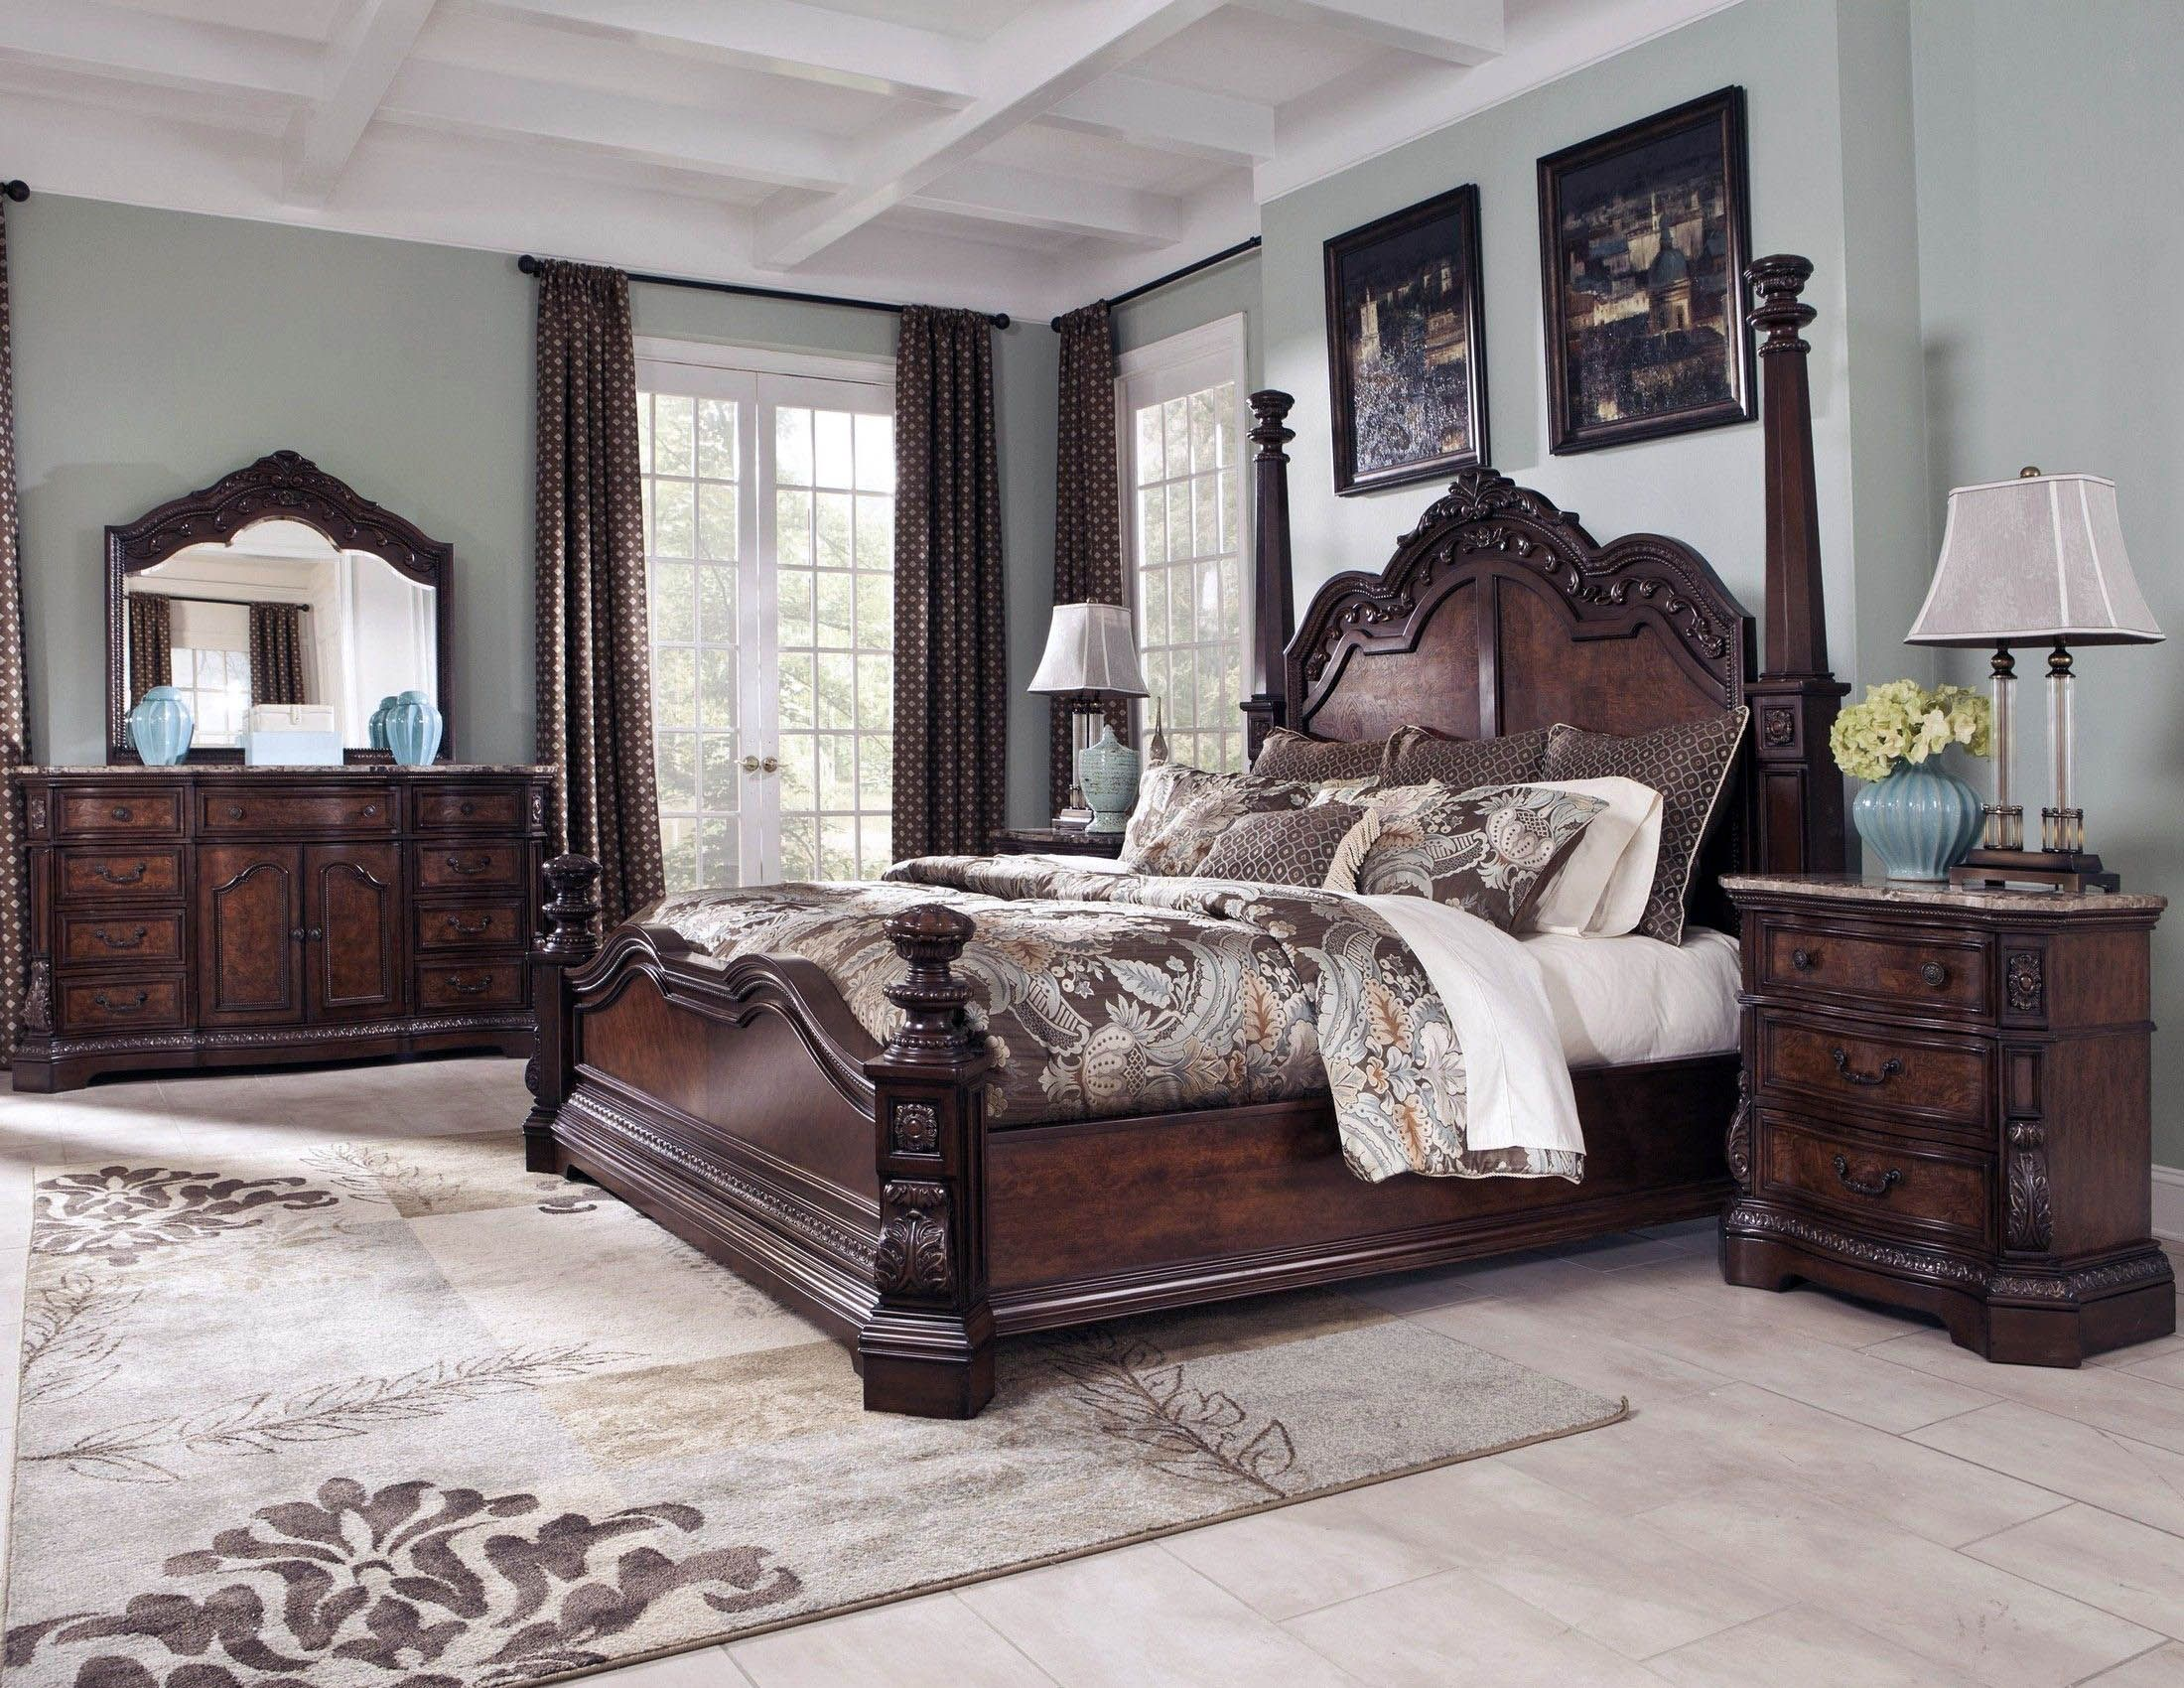 Stunning Low Budget Bedroom Furniture Sets Bassett You Ll Love